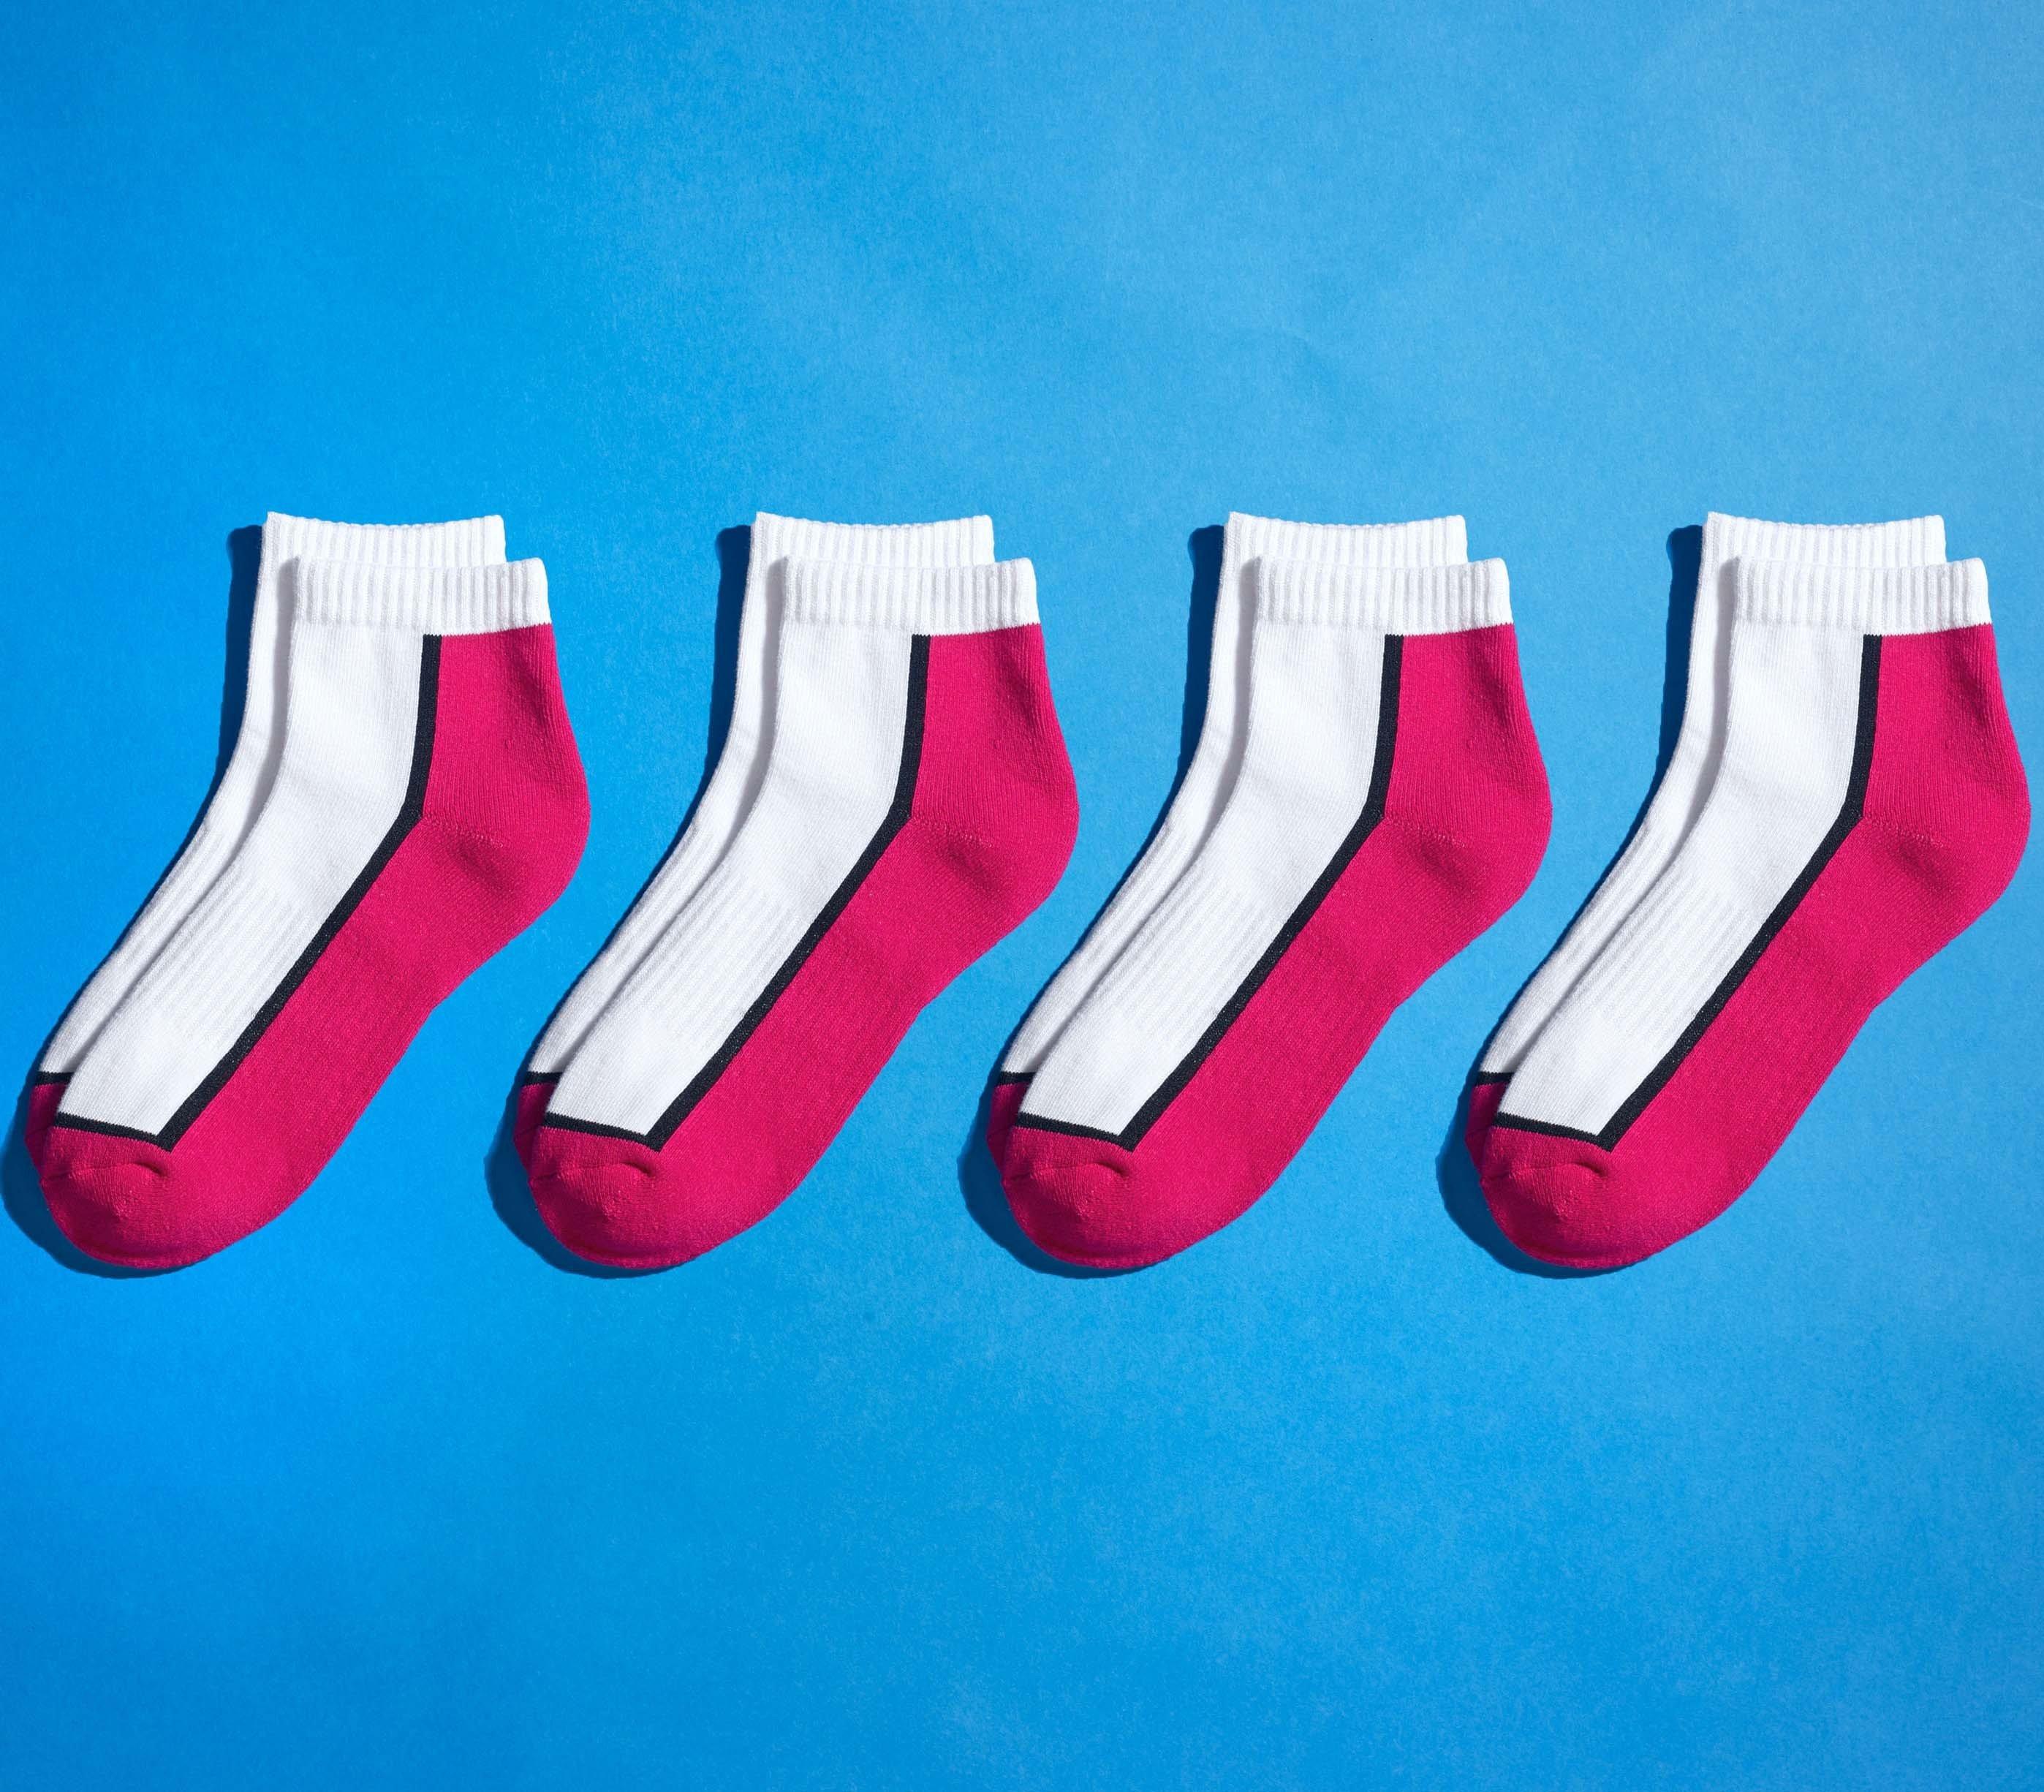 Unisex-Sneakers  set di 4 paia